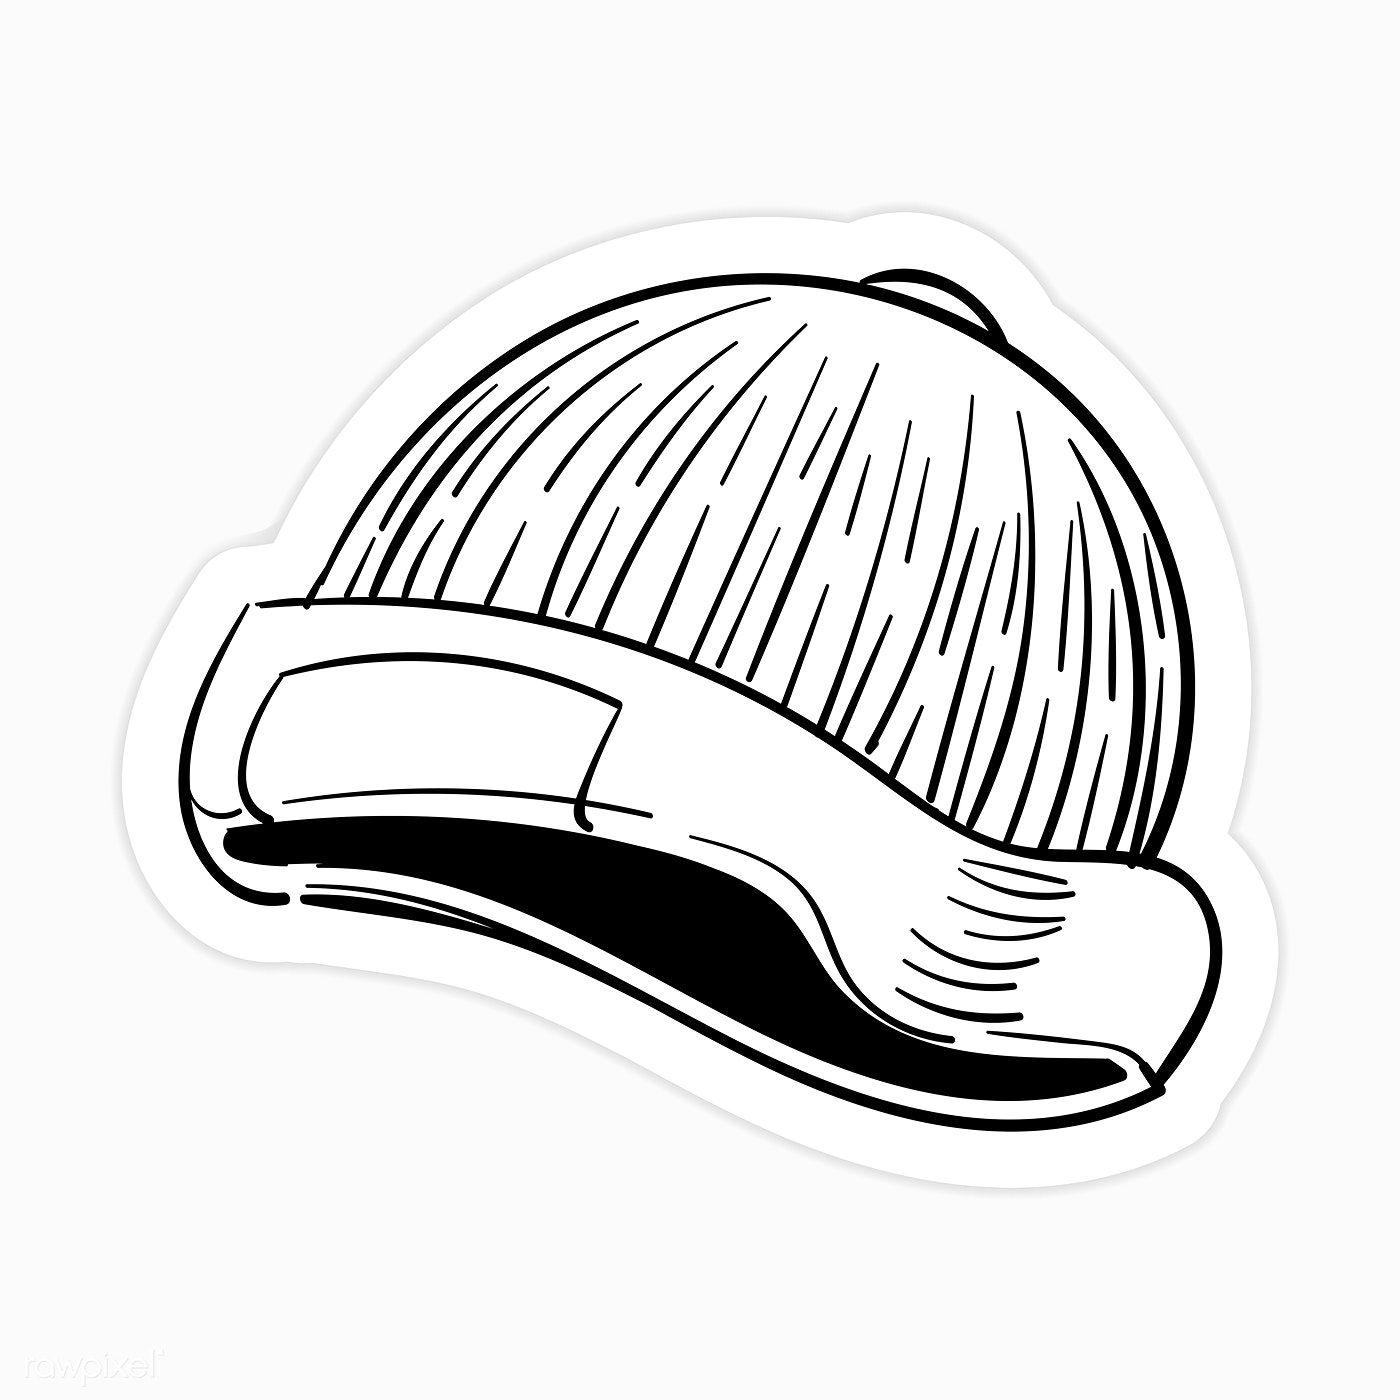 Download Premium Illustration Of Black And White Yarn Hat Sticker Sticker Black And White Stickers Black And White Doodle Cloud Stickers